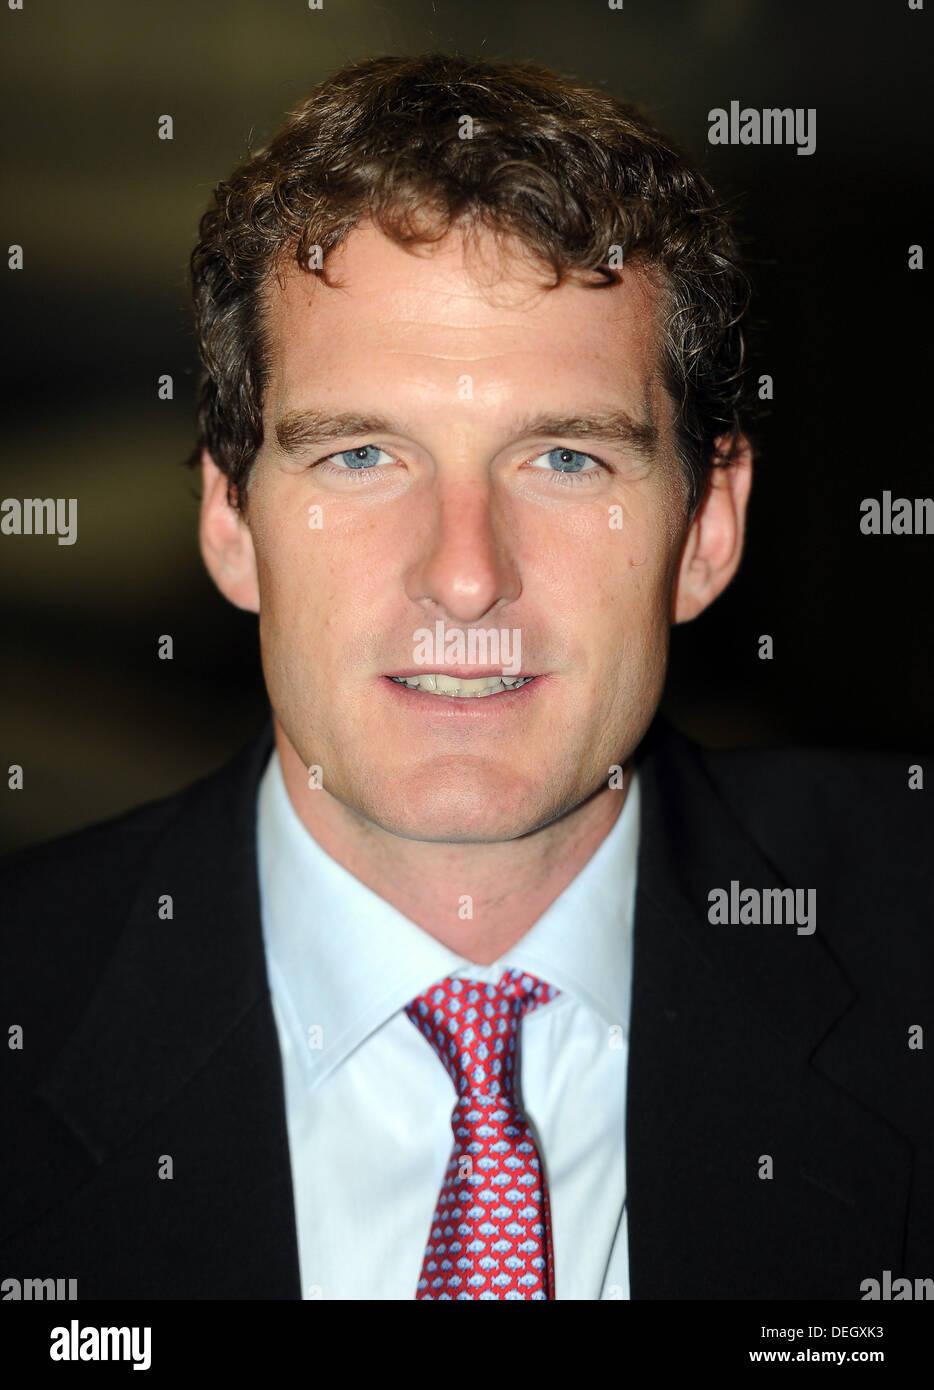 TV presenter Dan Snow - Stock Image